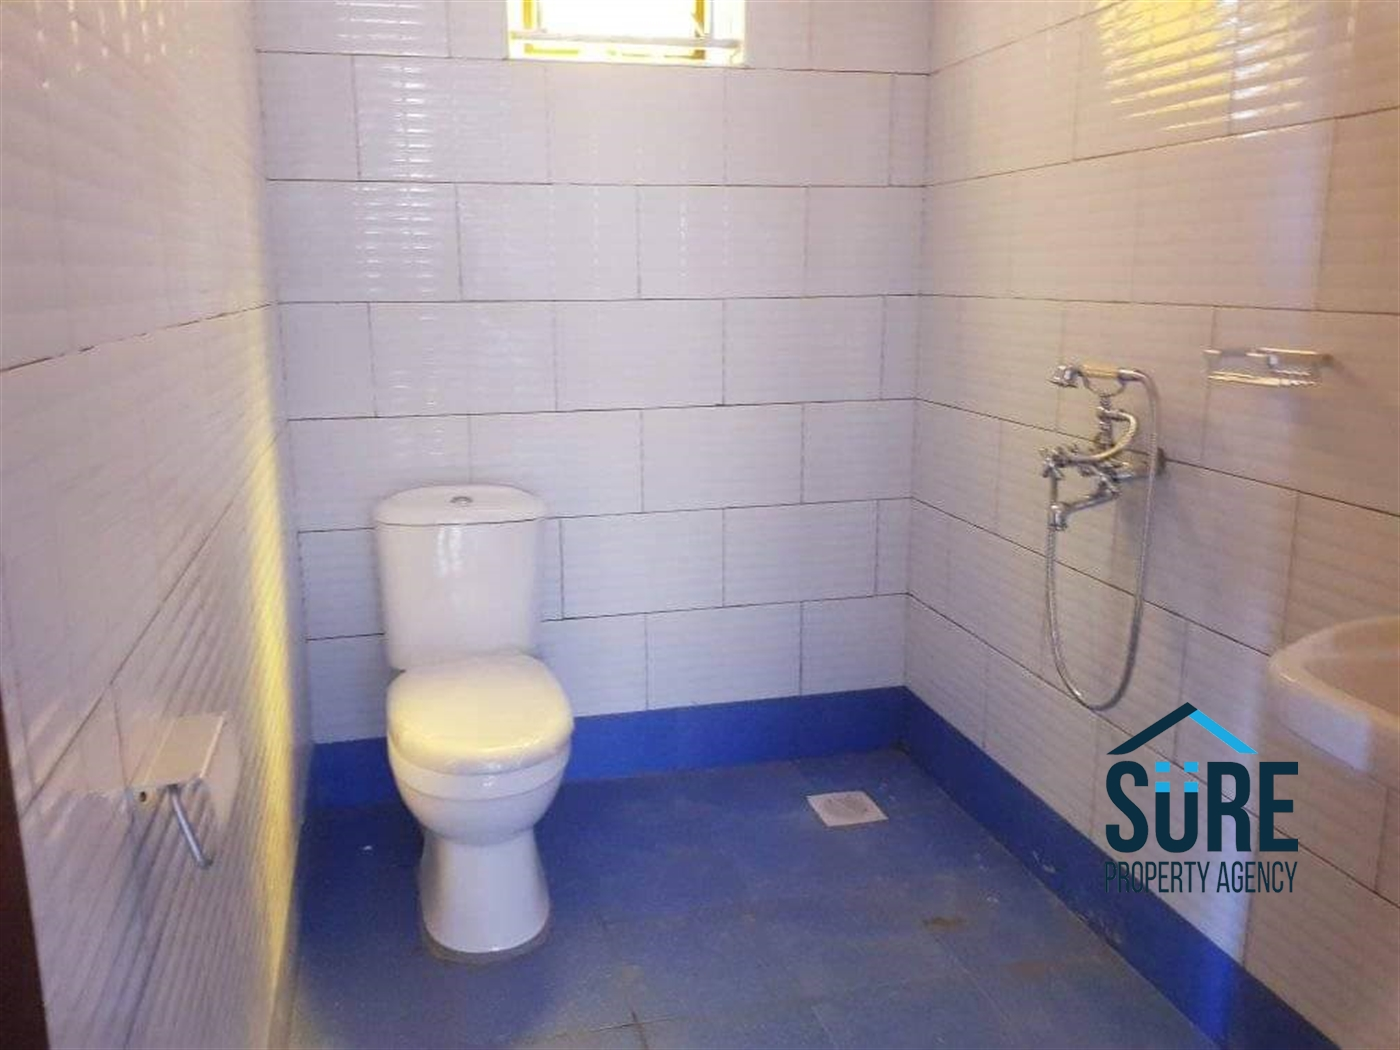 Apartment for rent in Munyoyo Kampala